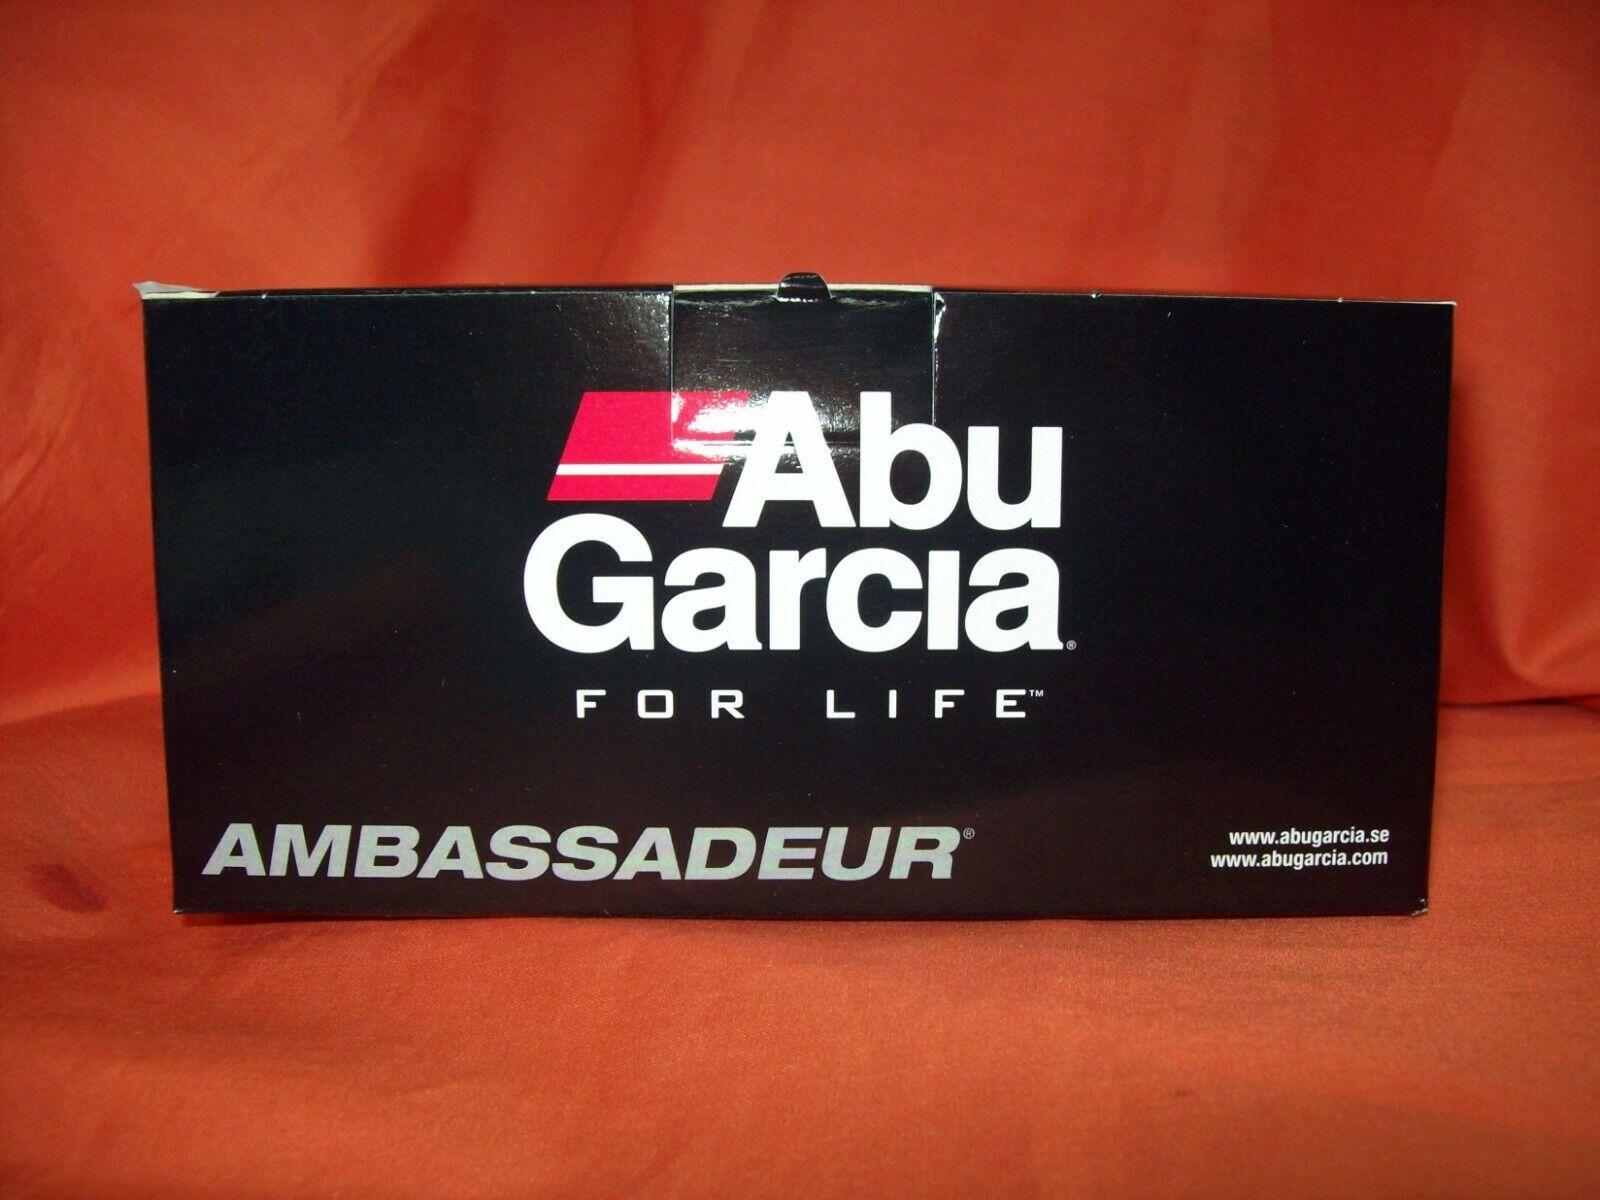 Aviador batalla uniforme Garcia Ambassadeur Classic 5501 C3 Baitcaster 5 3 1 GR C3-5501 1292721 LH